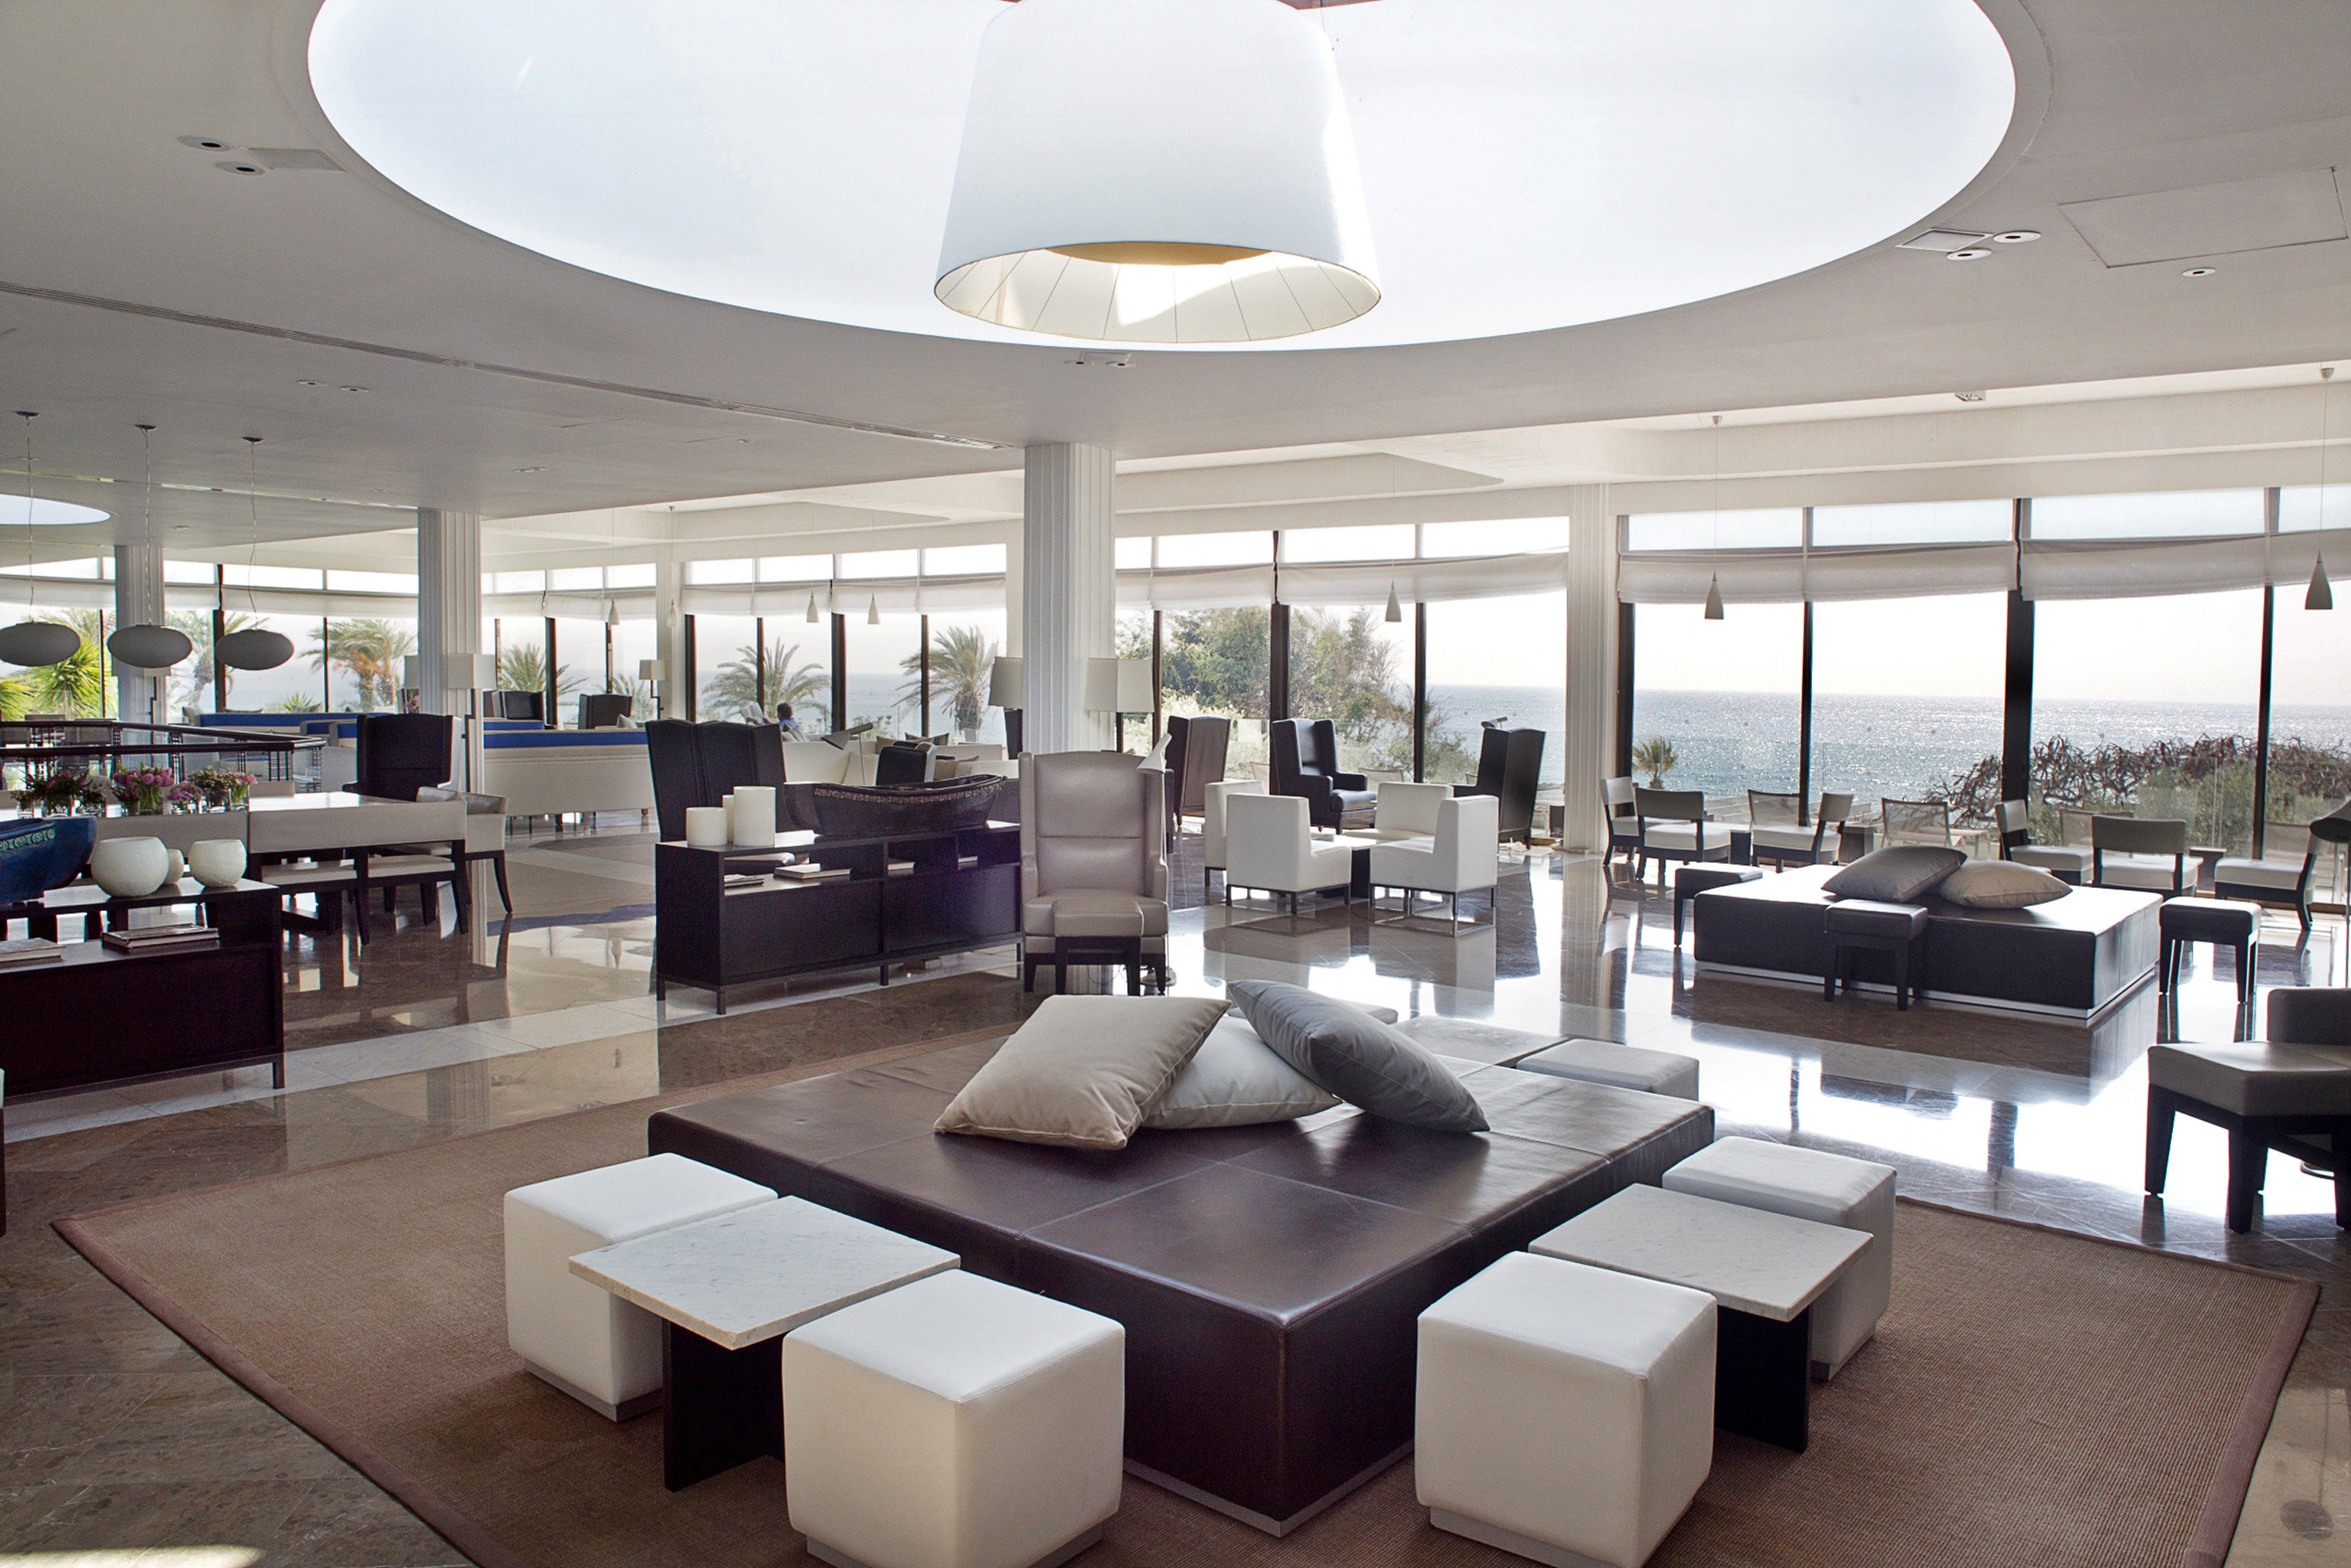 Elegant Family Island Lobby Lounge Modern Scenic views Waterfront property yacht living room lighting condominium restaurant Resort headquarters convention center